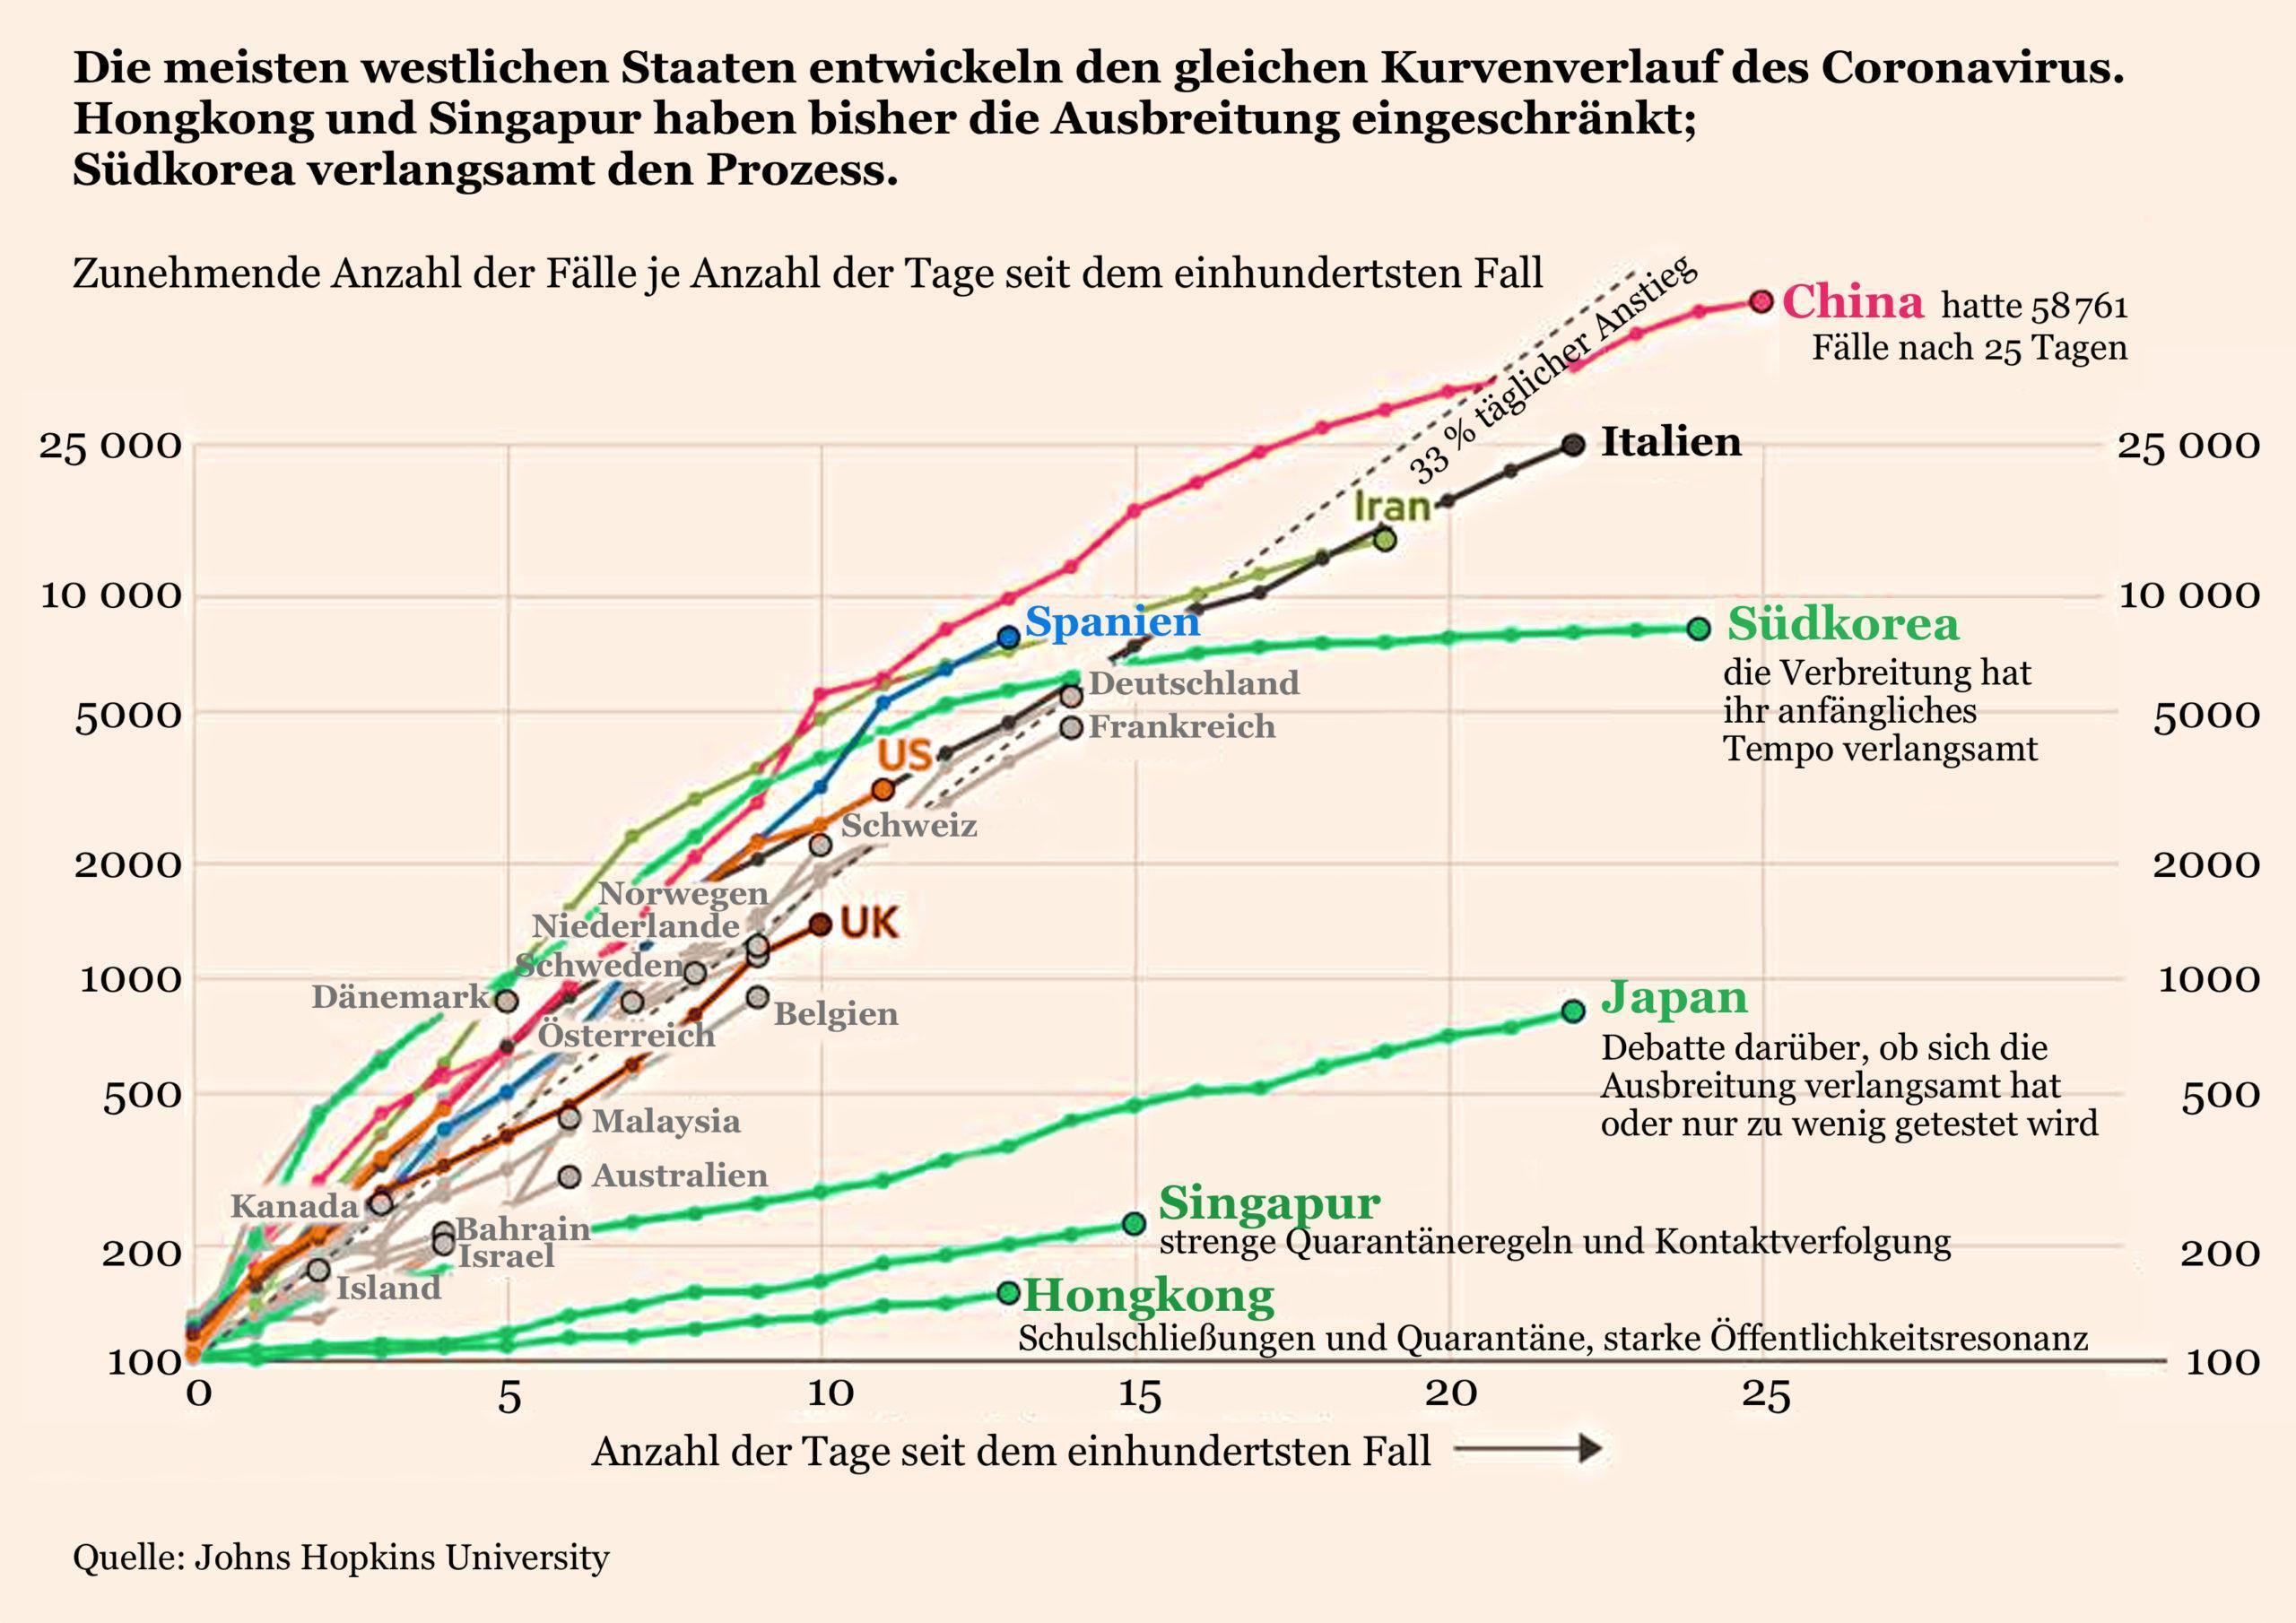 Coronastatistik Deutschland